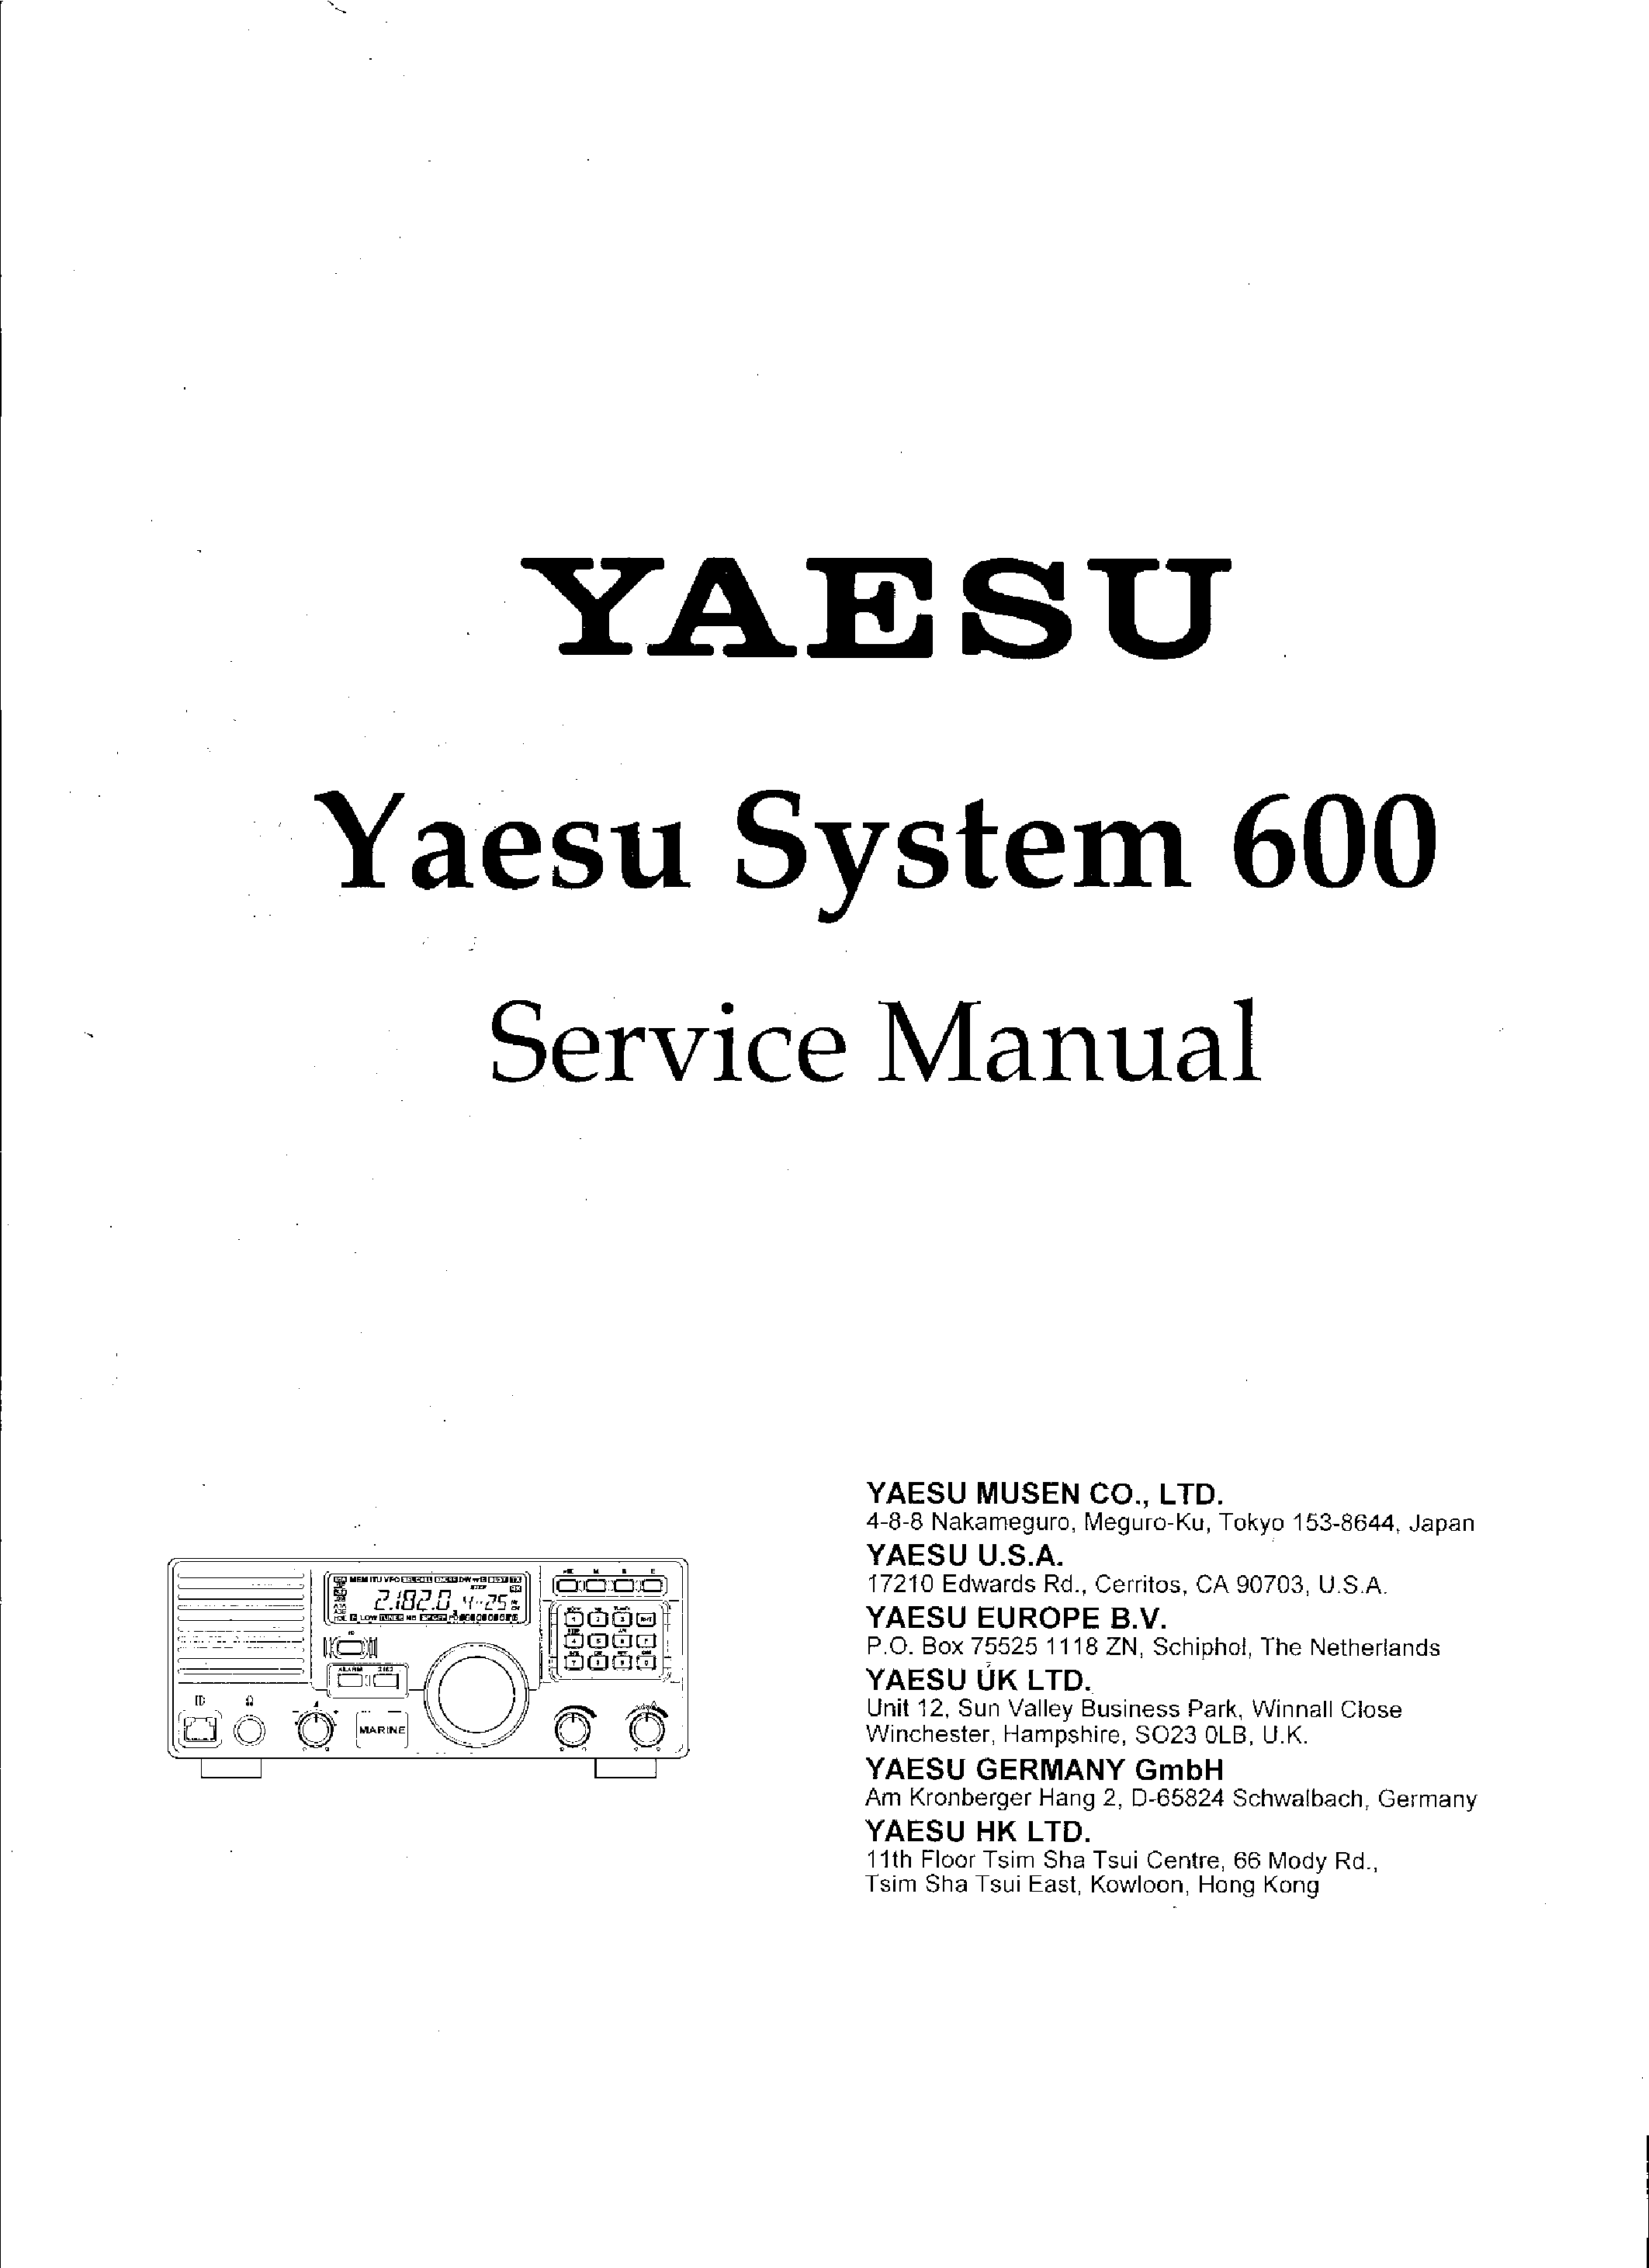 yaesu system 600 sm service manual download schematics eeprom rh elektrotanya com Yaesu FT 840 Specifications Yaesu FT 6